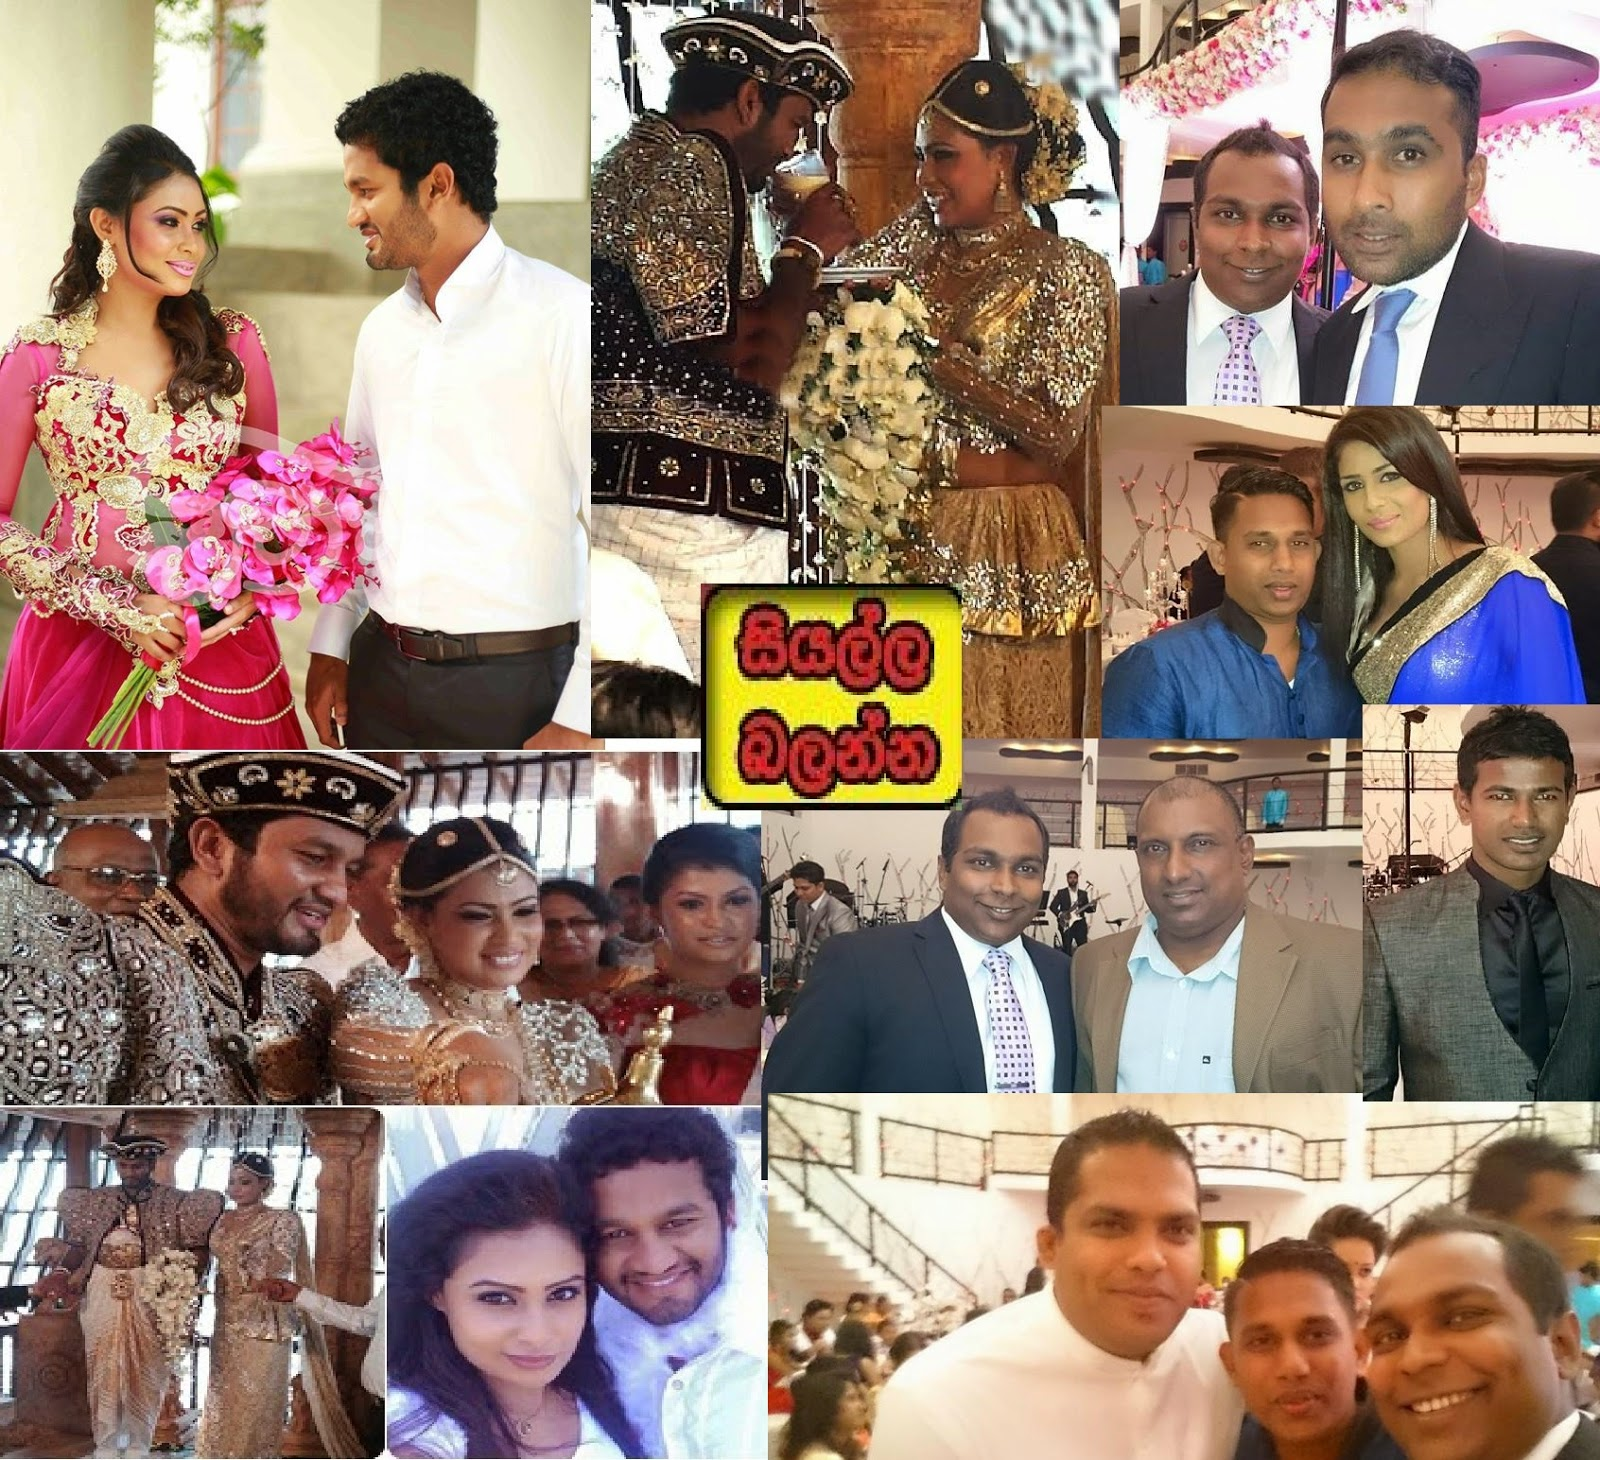 http://picture.gossiplankahotnews.com/2015/04/dimuth-karunarathne-wedding-moments.html